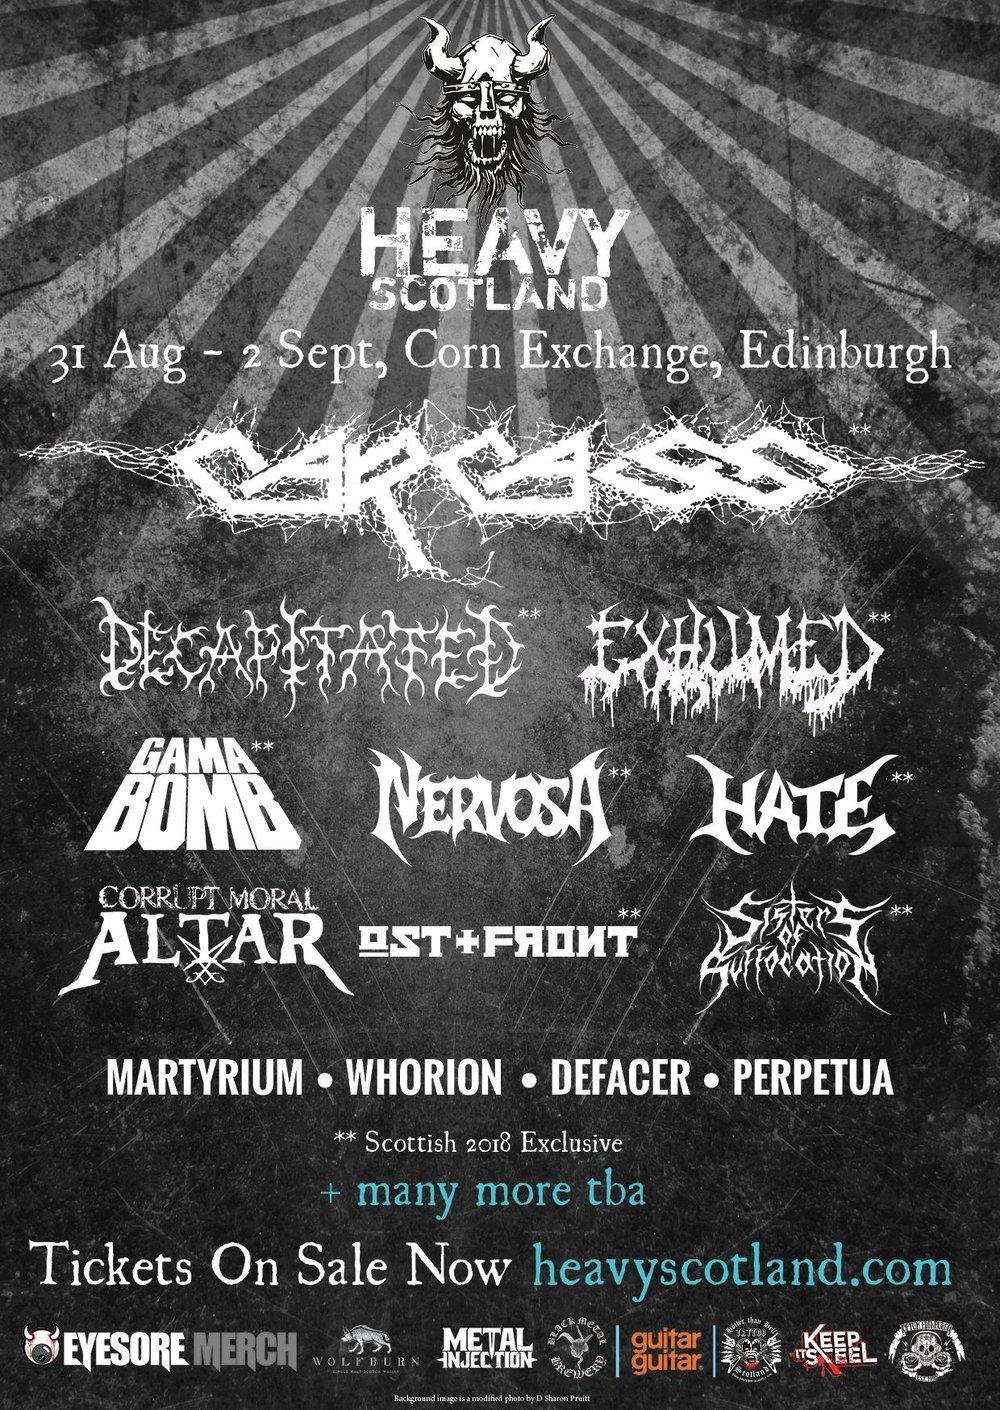 Heavy Scotland 2018 Third Announcement Poster.jpg